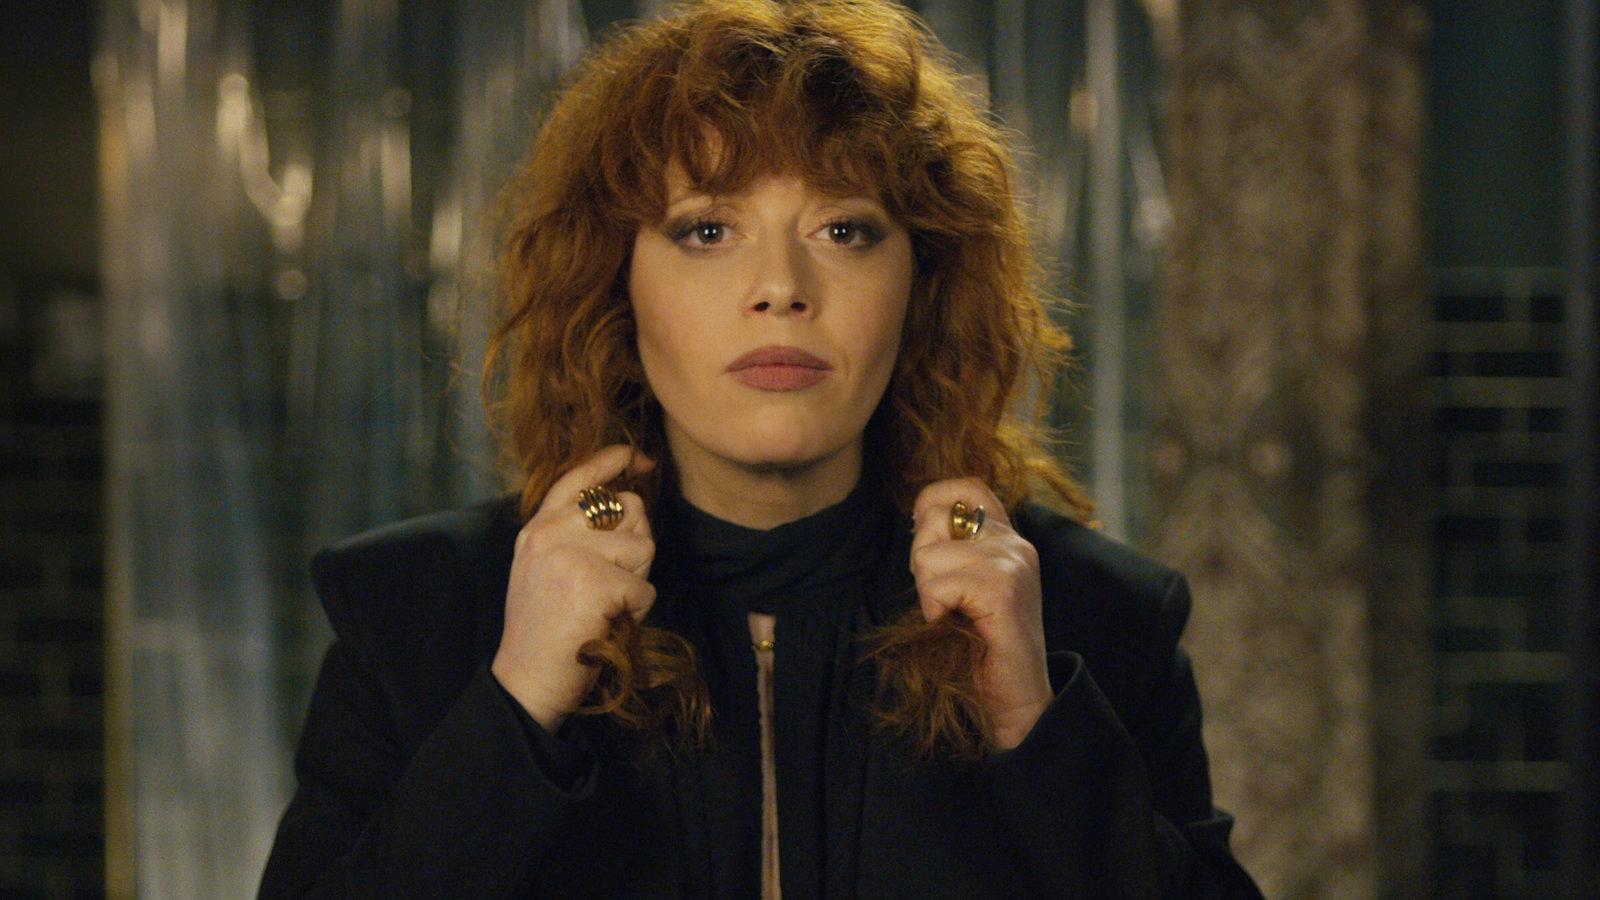 Natasha Lyonne in Russian Doll on Netflix